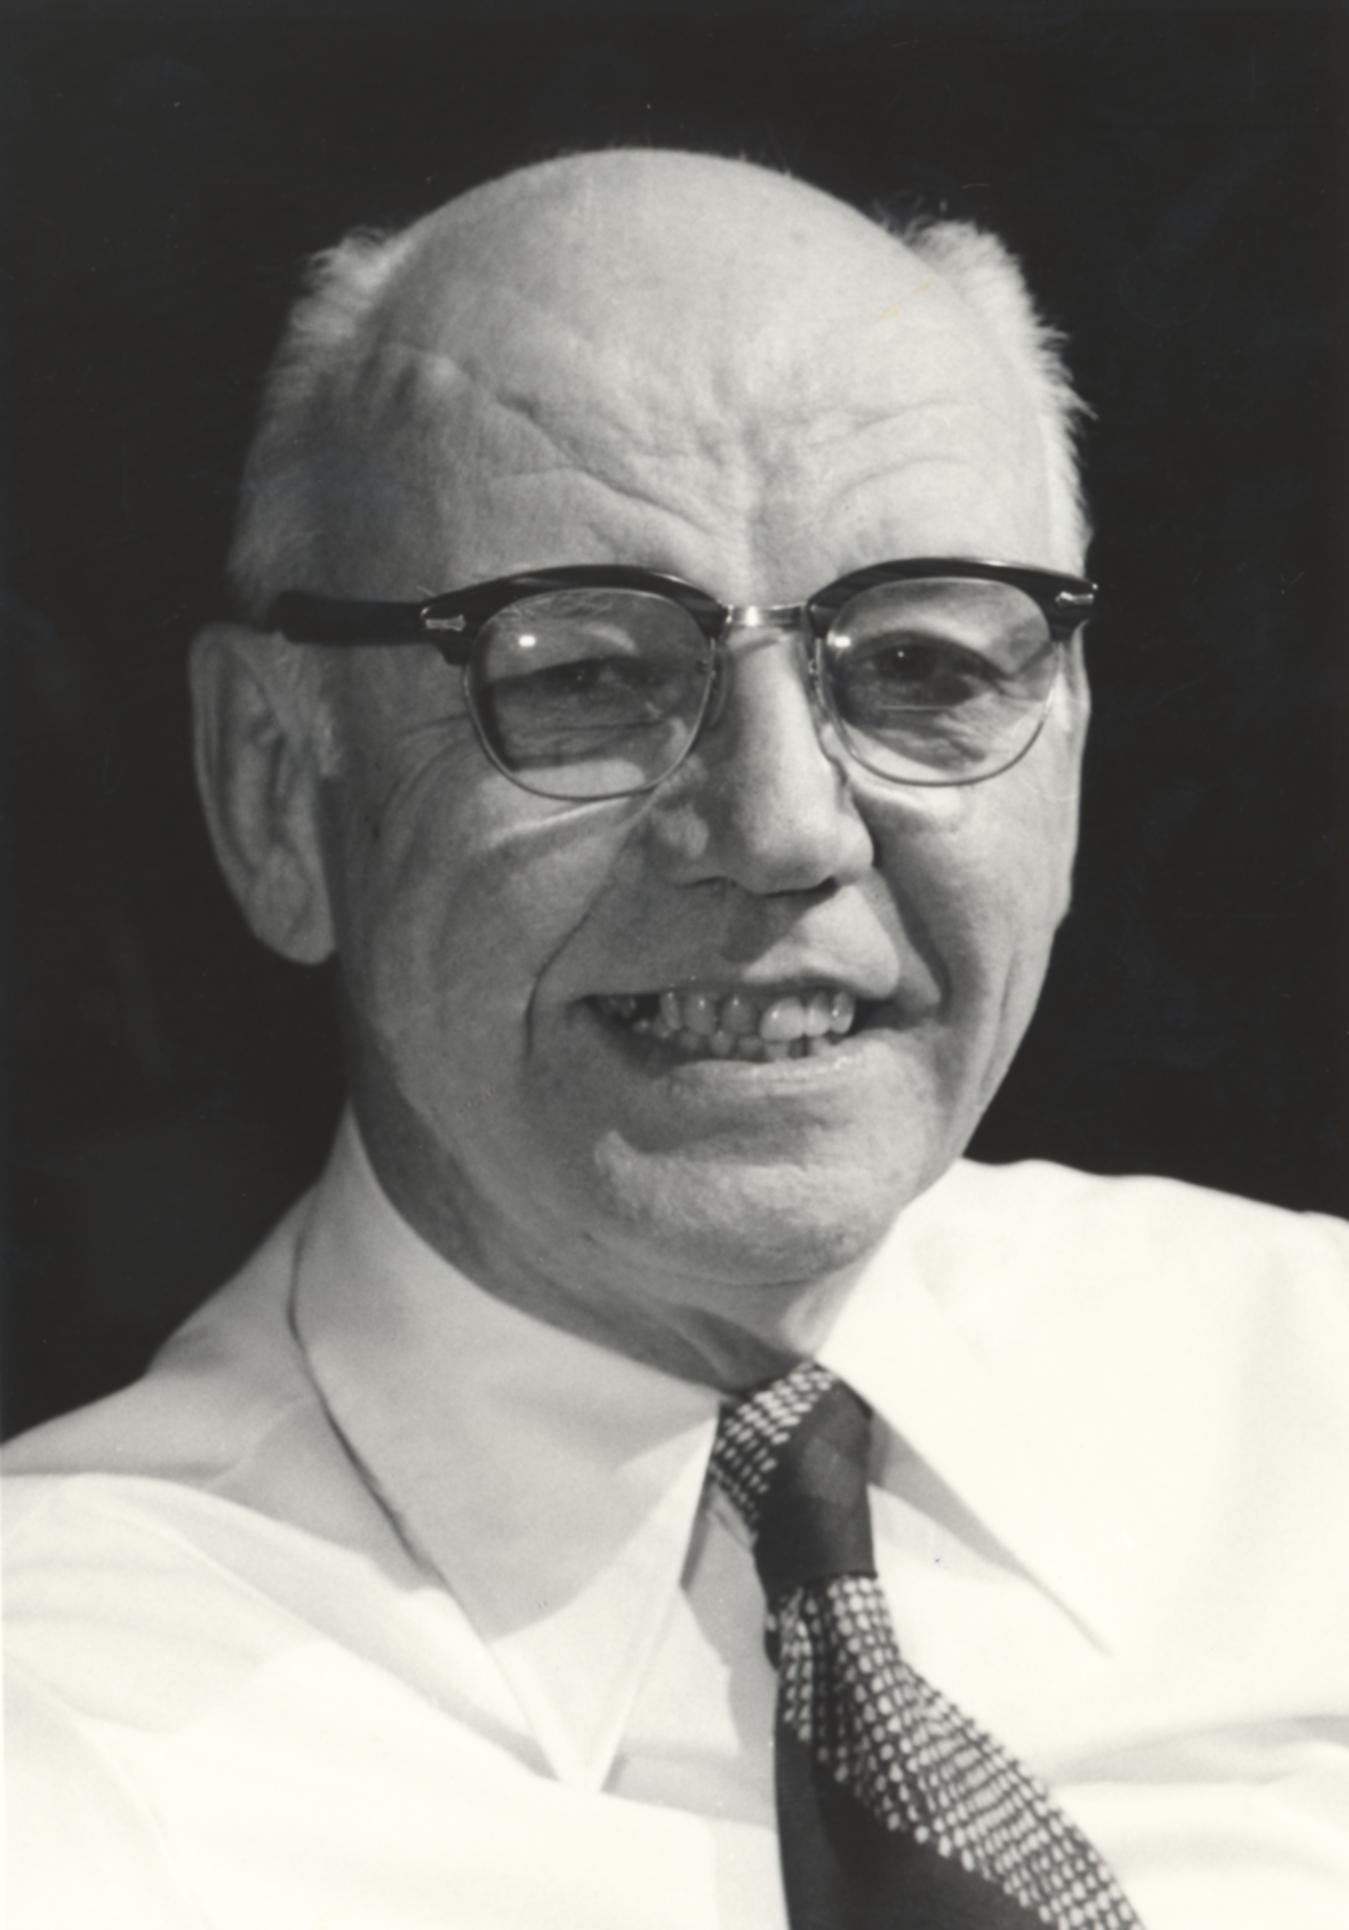 IX. Imago Mundi-Kongress 1982, Innsbruck, Prof. Dr. Walter H. Uphoff